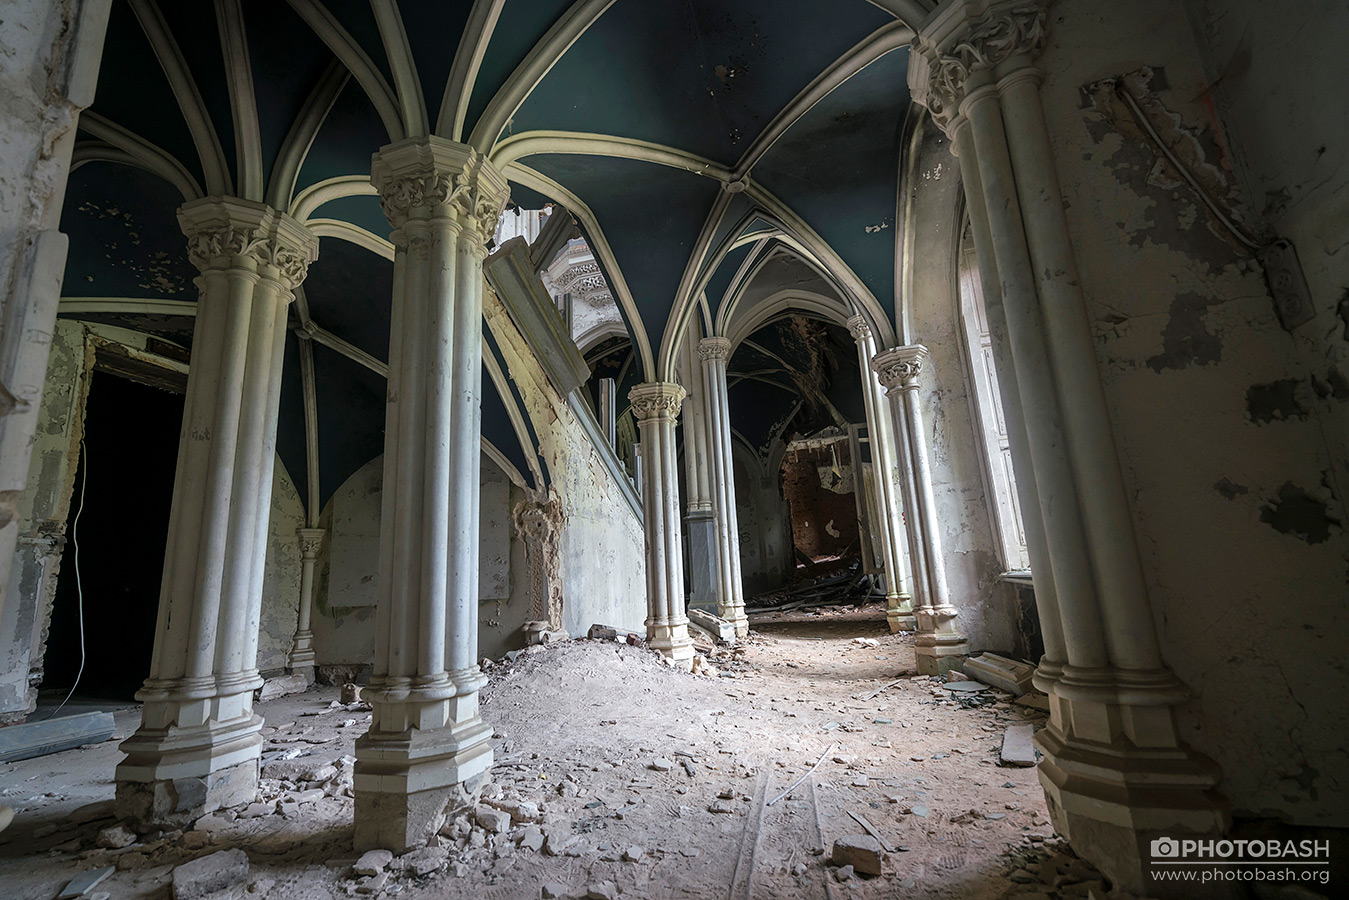 Overgrown-Castle-Derelict-Interior.jpg